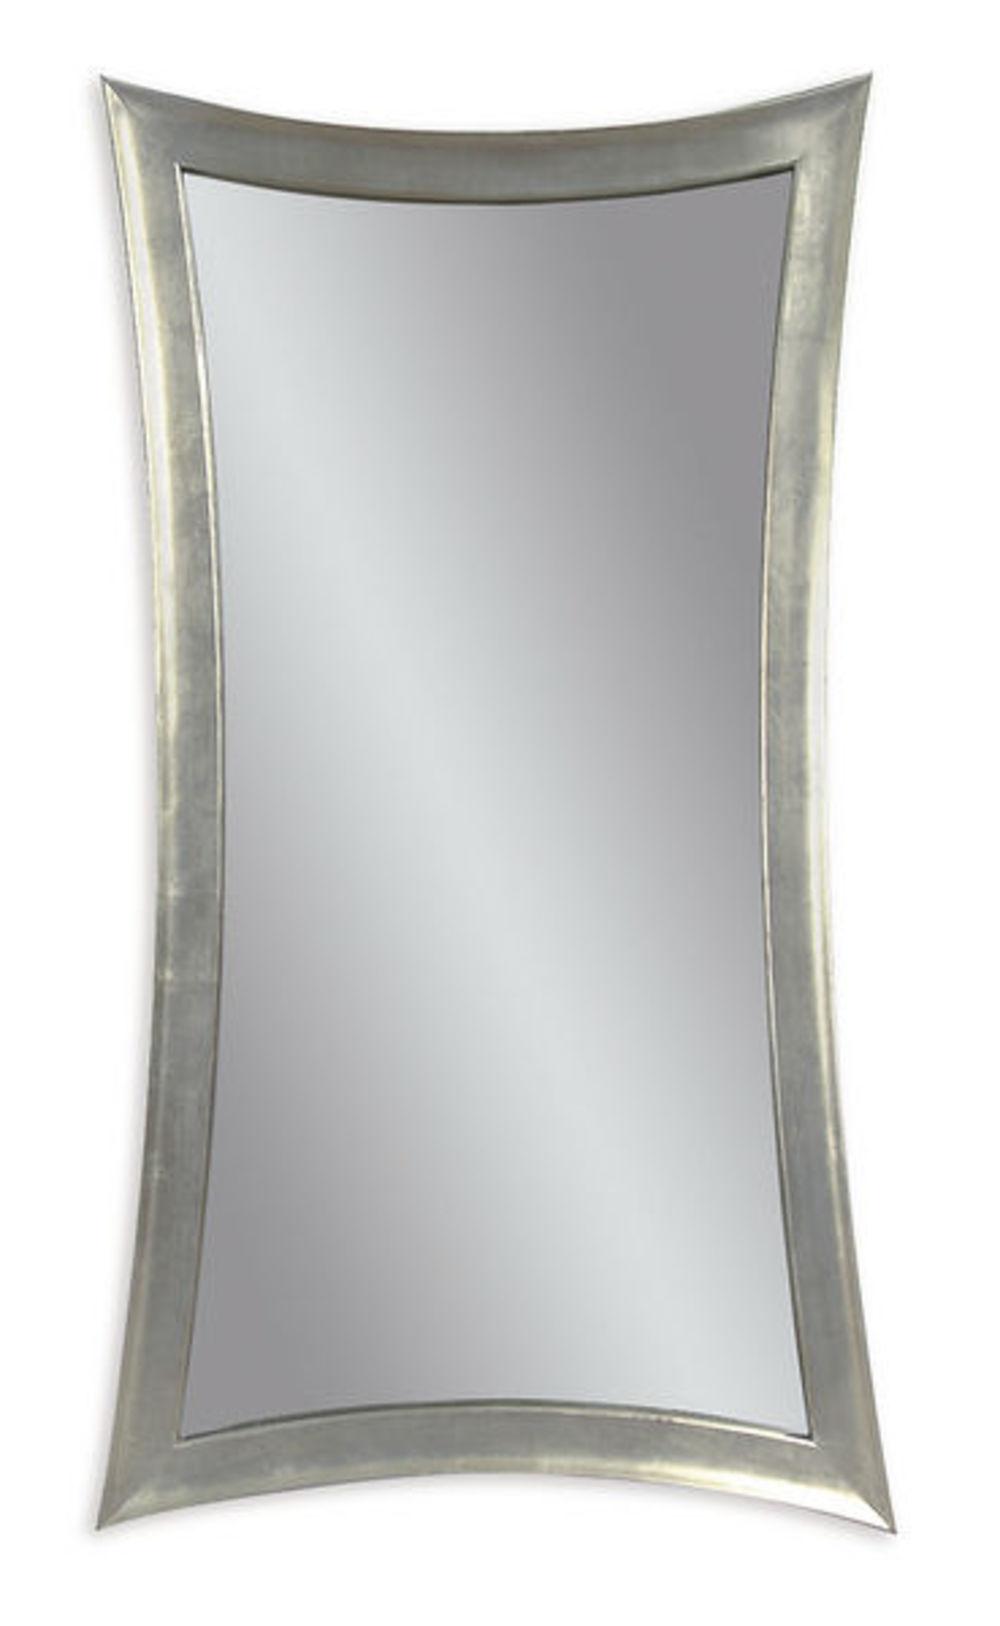 Bassett Mirror Company - Hour-Glass Shaped Leaner